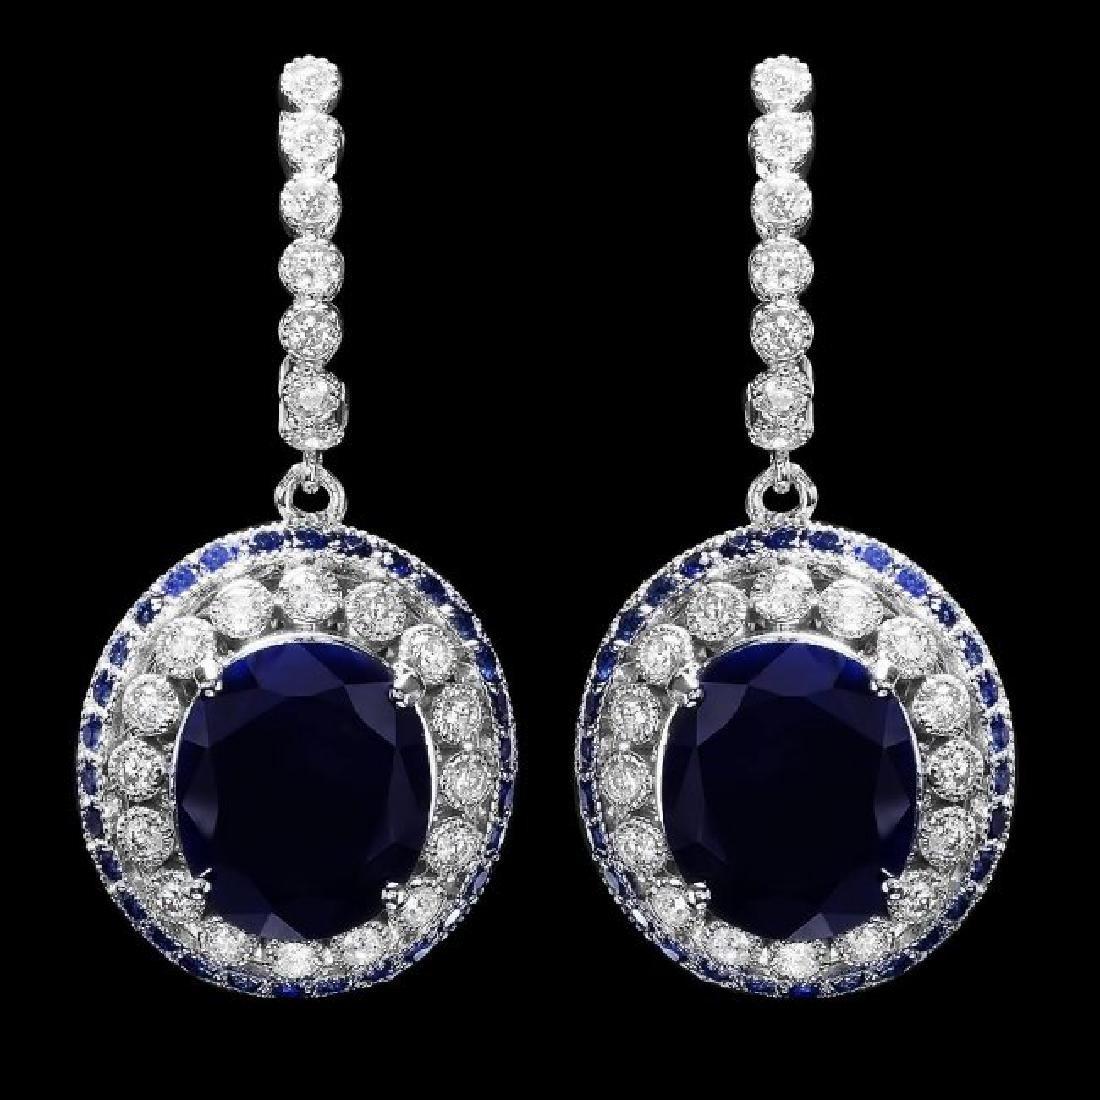 14k Gold 14.7ct Sapphire 1ct Diamond Earrings